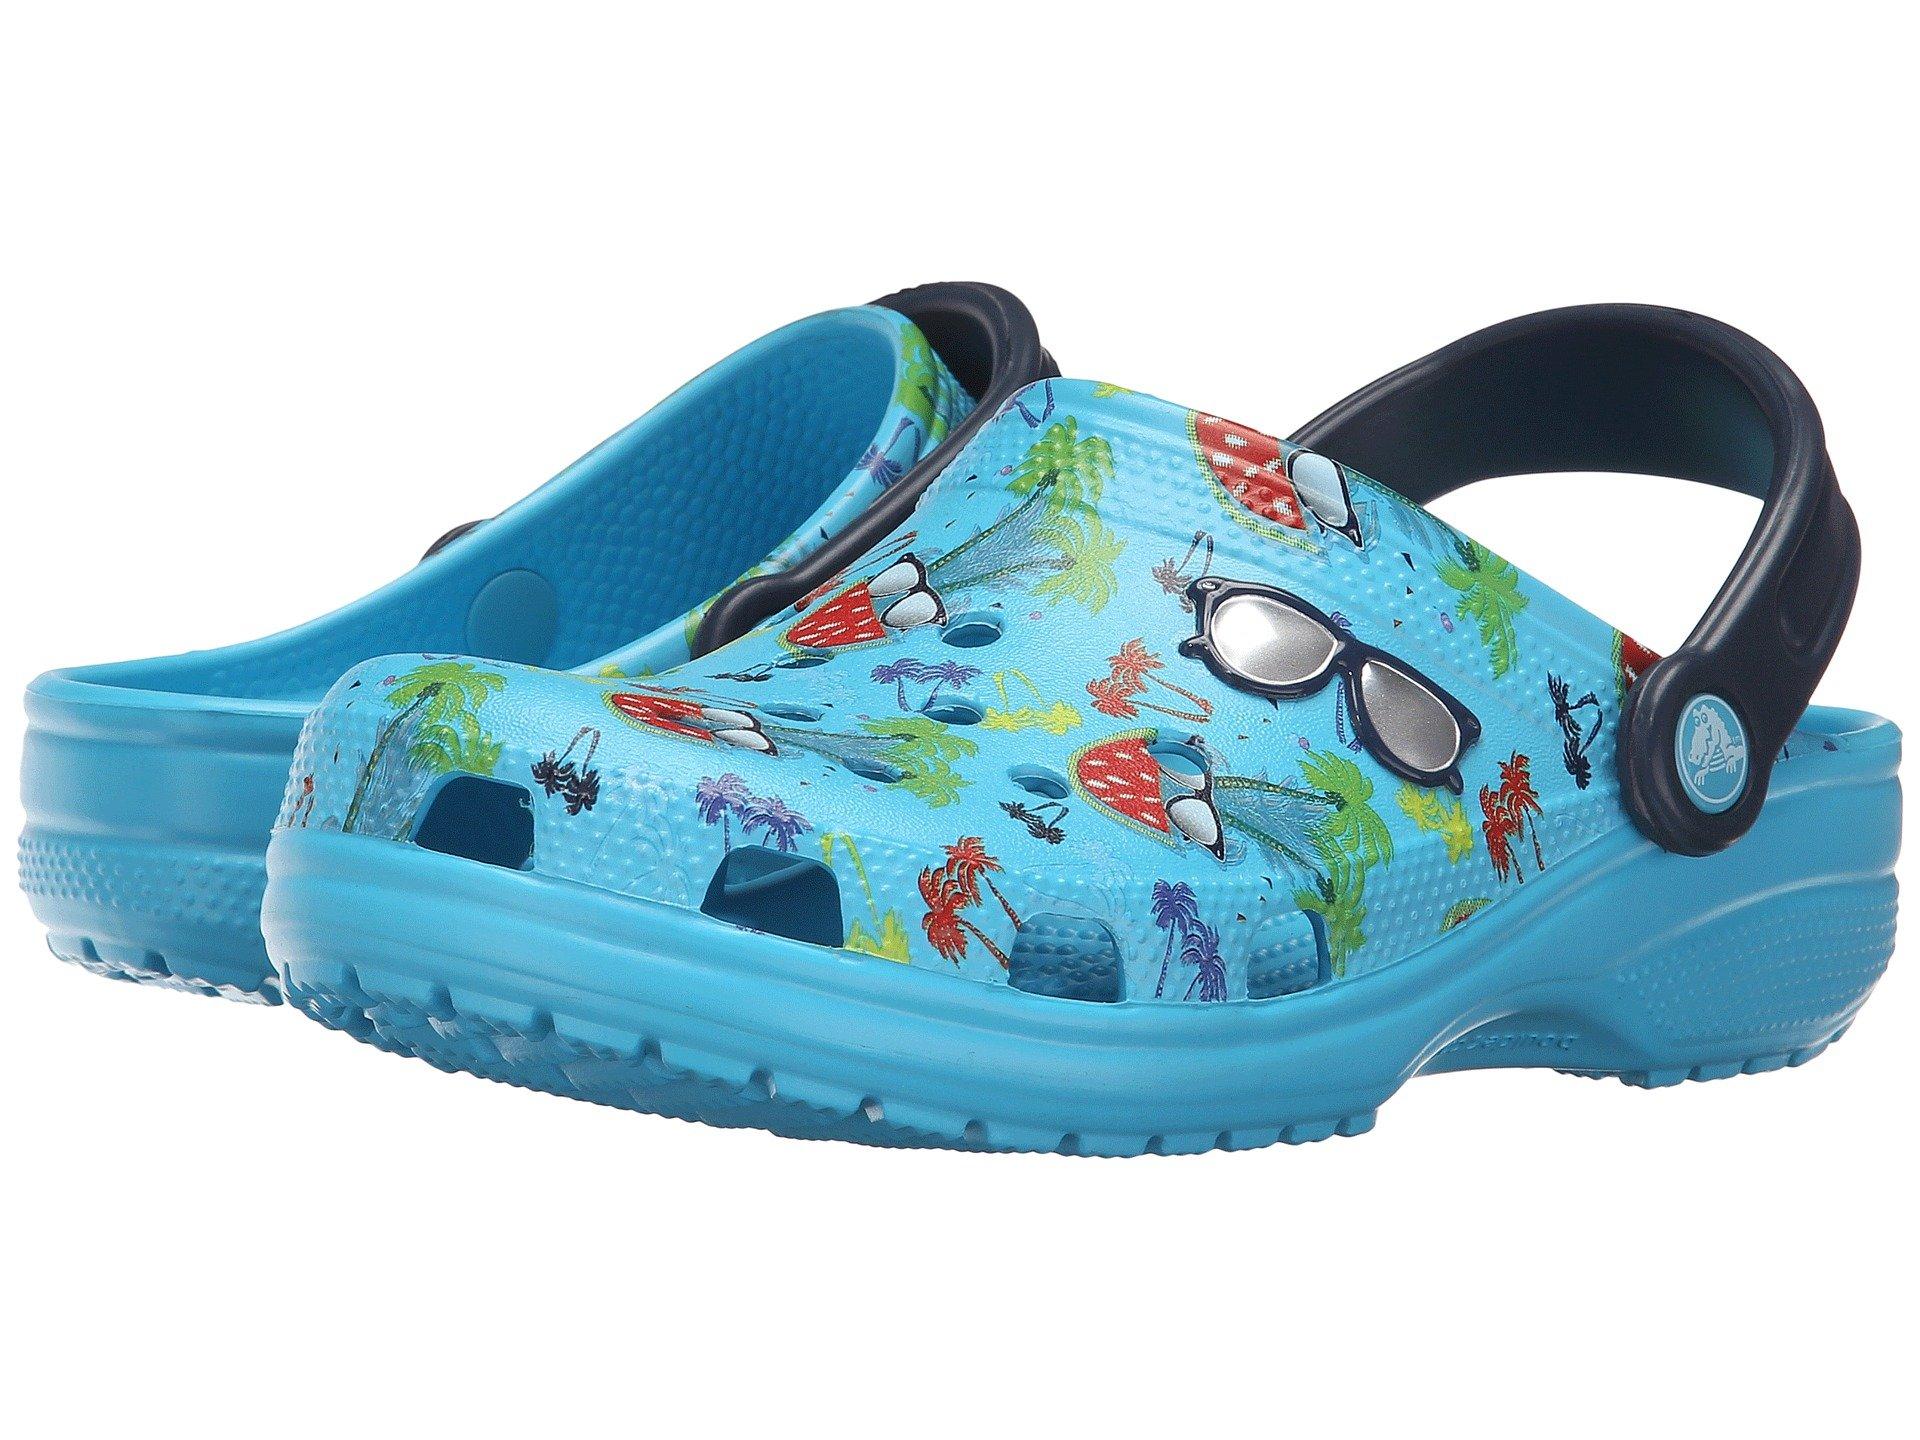 Zuecos para Mujer Crocs Classic Summer Fun Clog  + Crocs en VeoyCompro.net